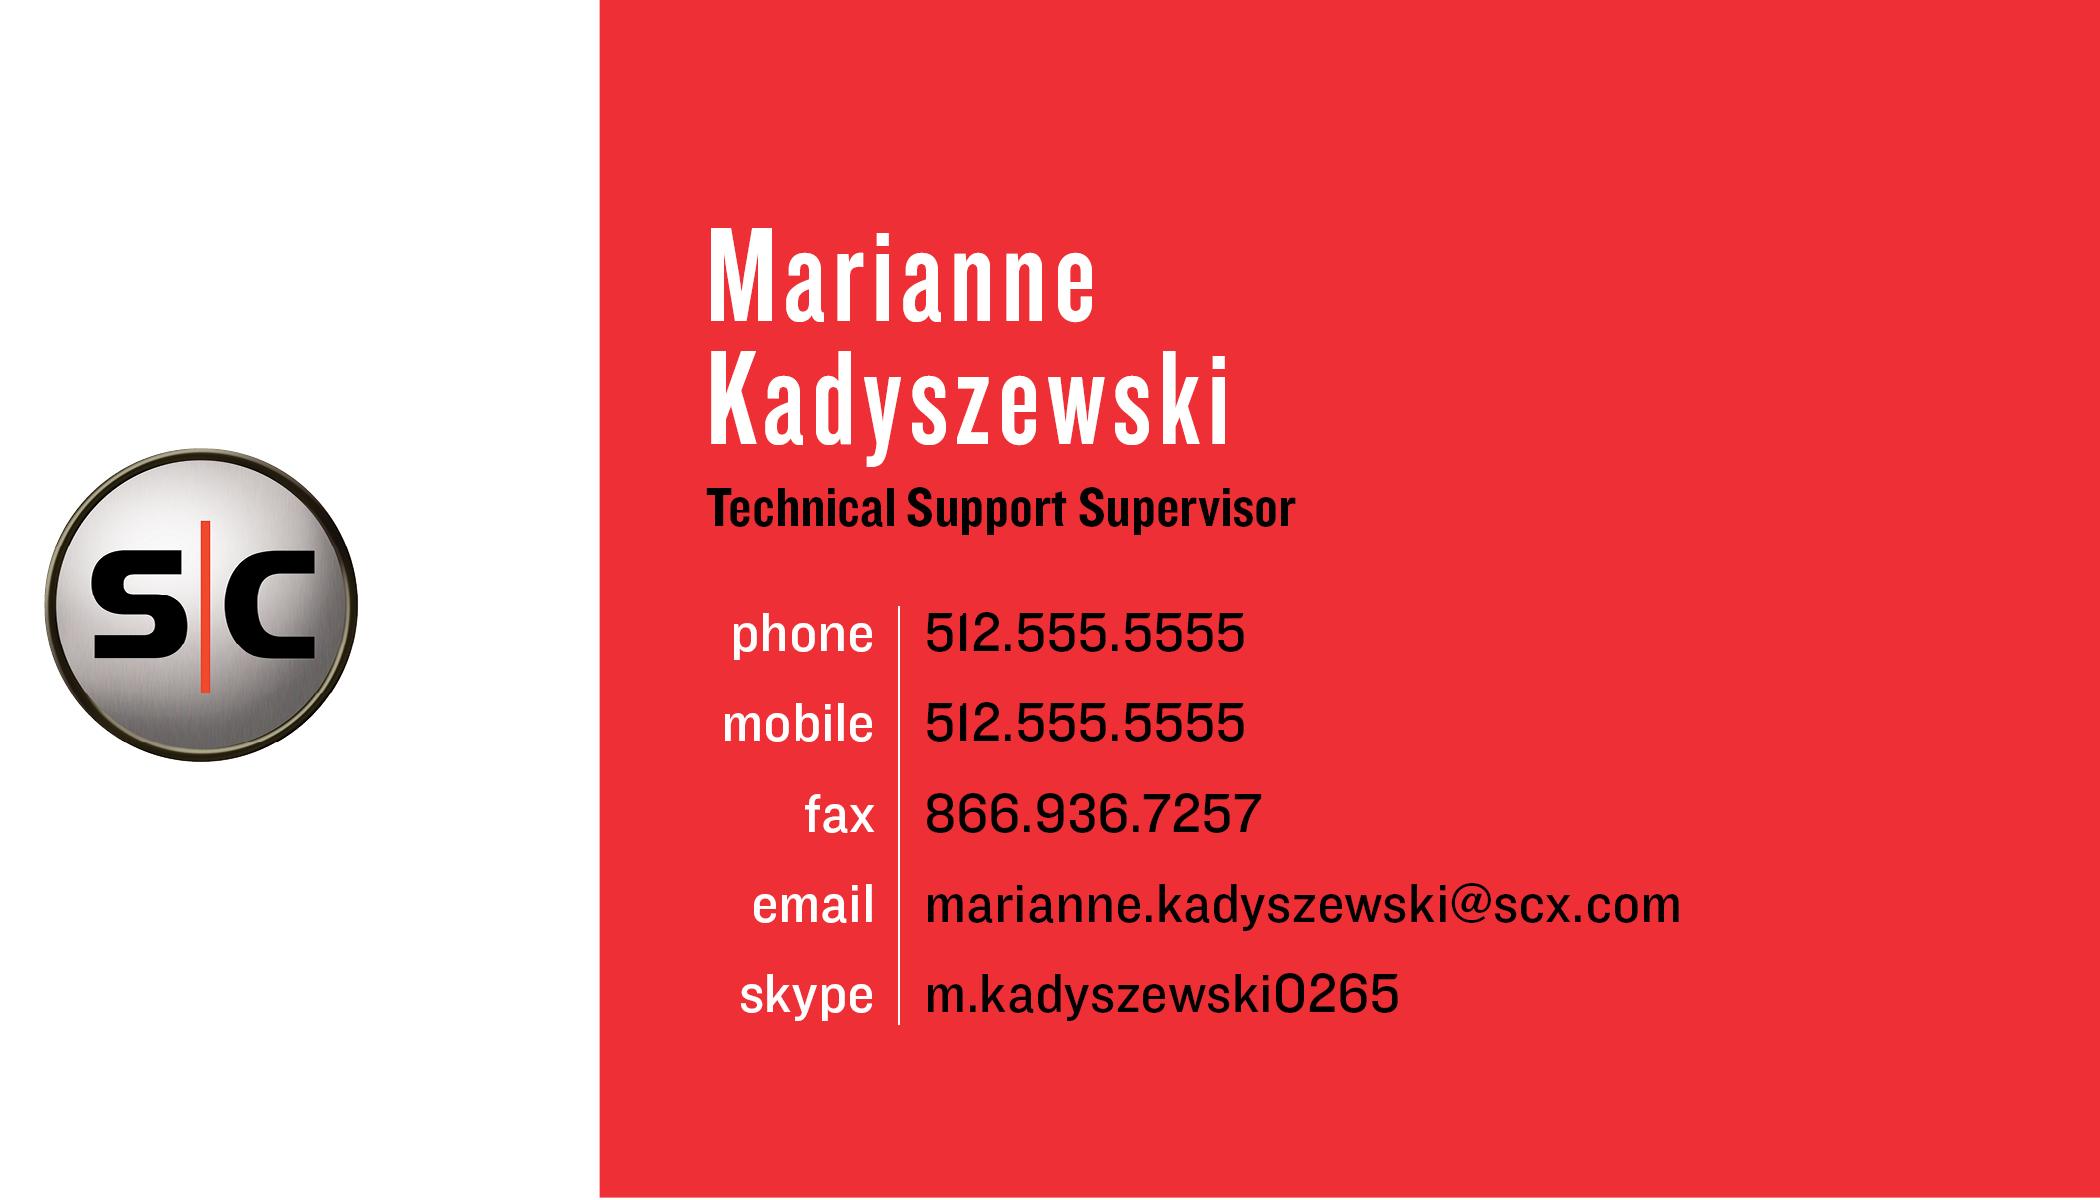 SC business card design concepts15.jpg